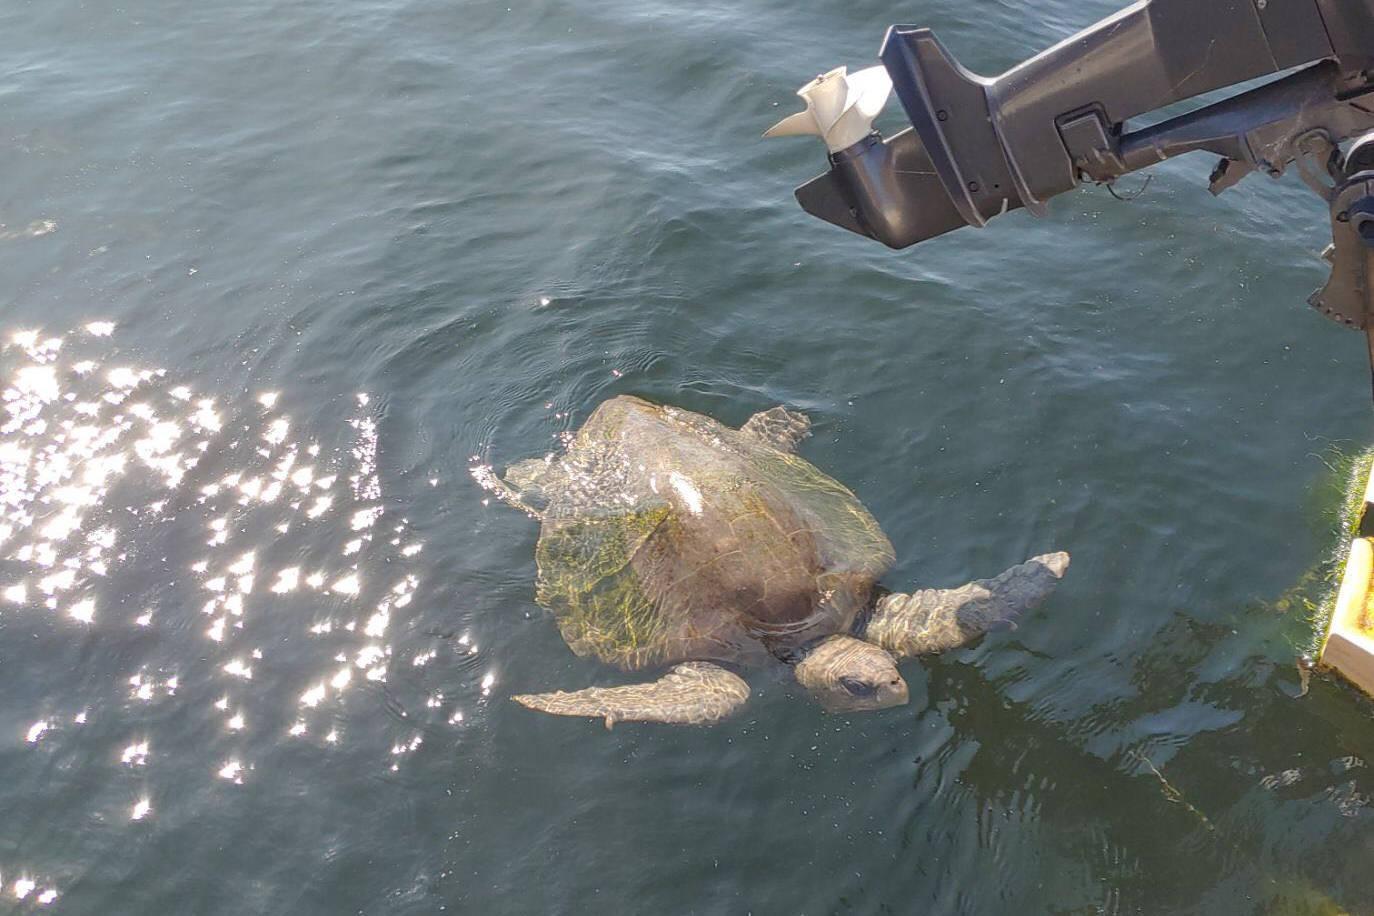 'Berni' was spotted in the Alberni Inlet on Sept. 30. PHOTO COURTESY KRAIG KIMOTO